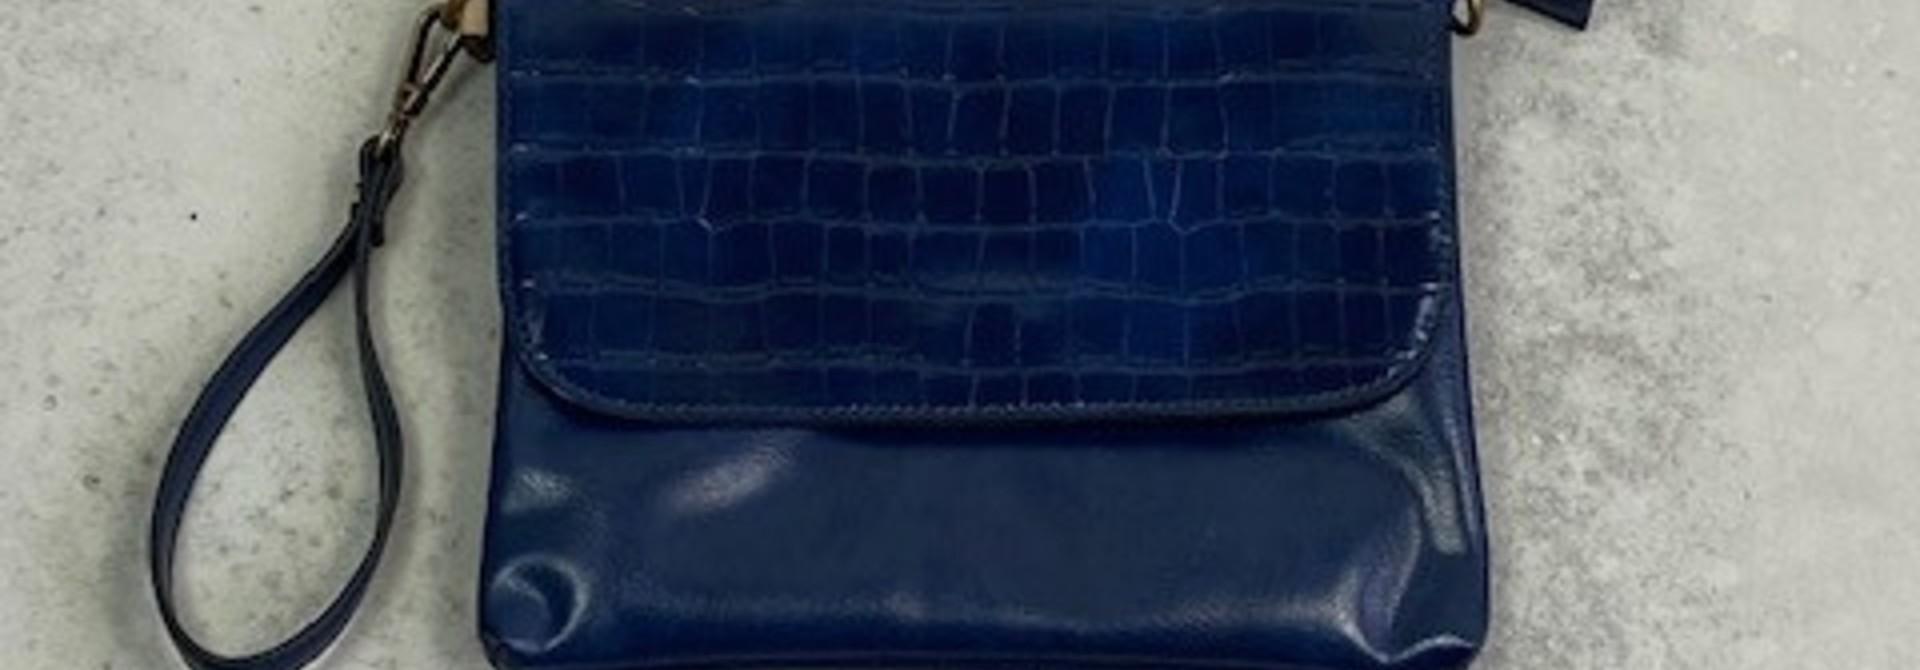 Munco croco bag Blue